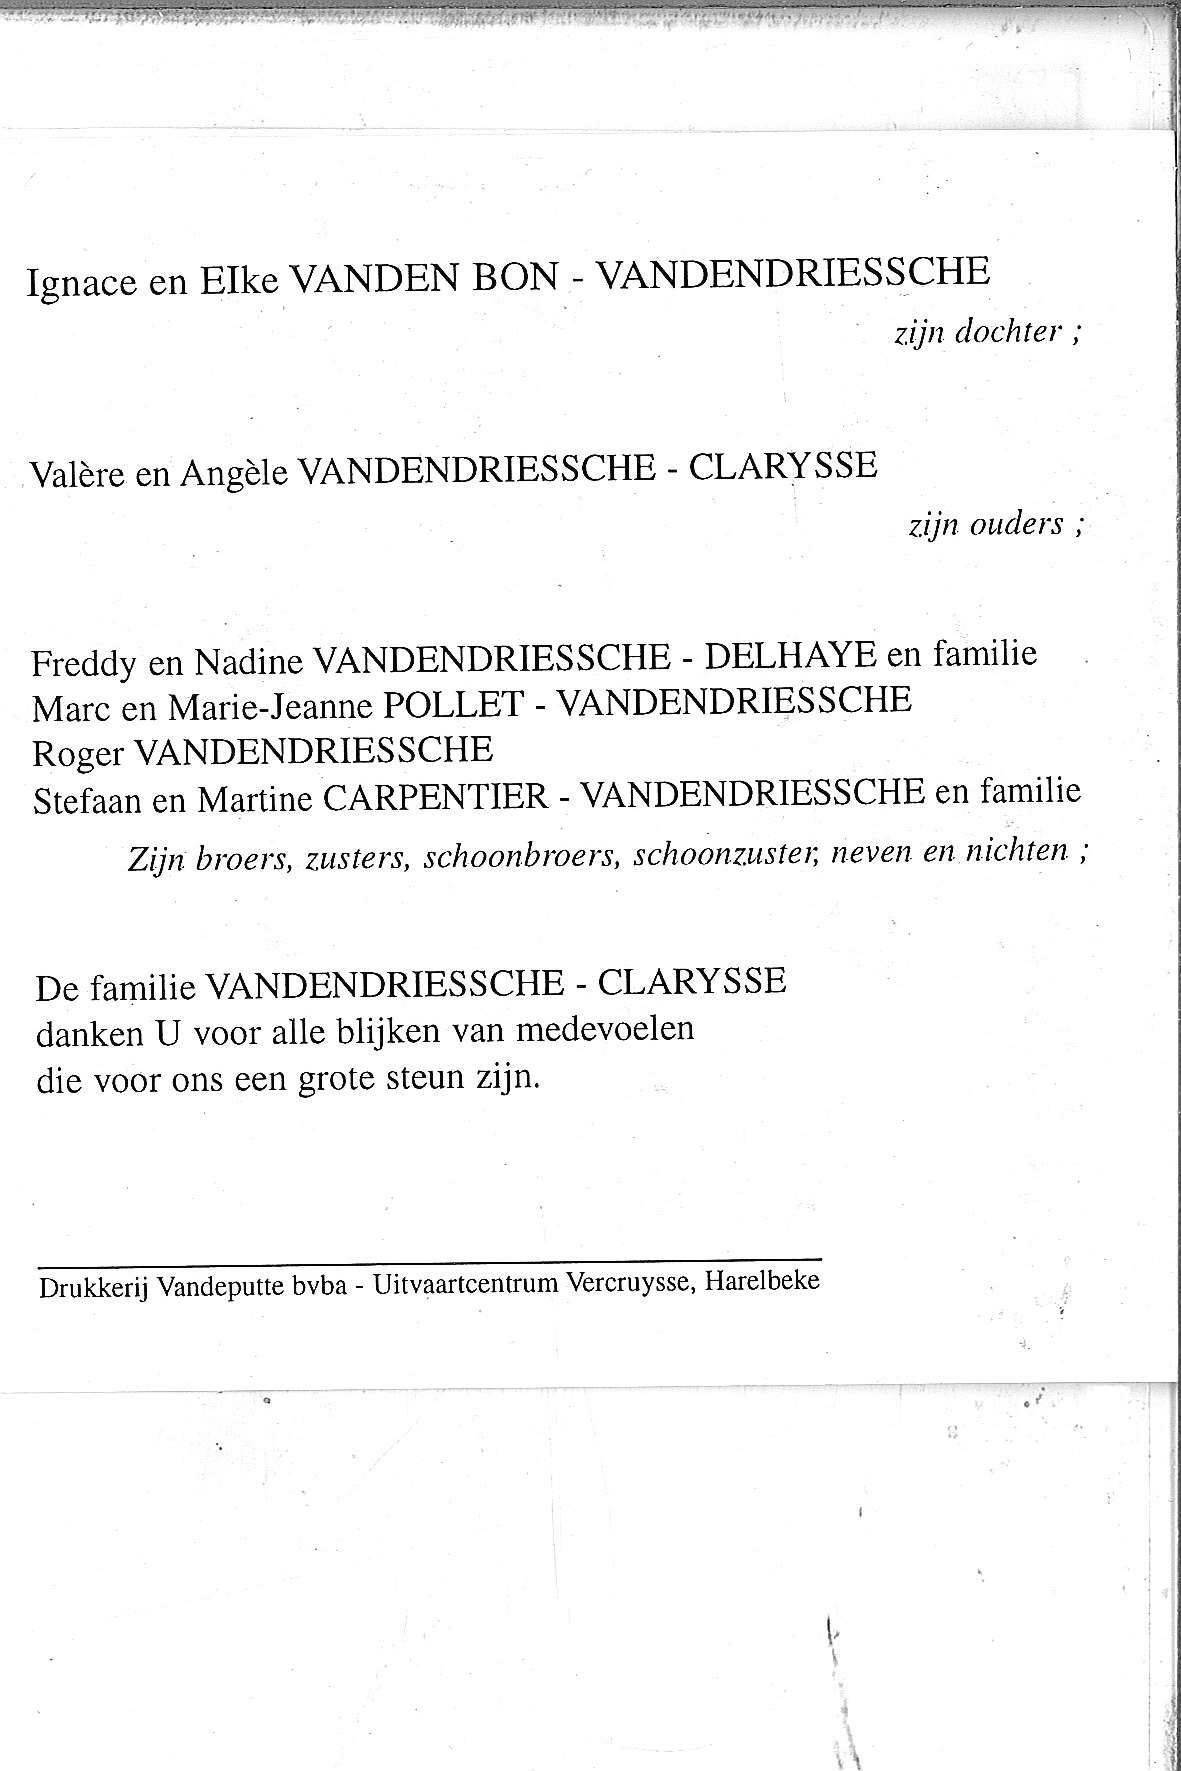 Rudy(2003)20140704154757_00095.jpg